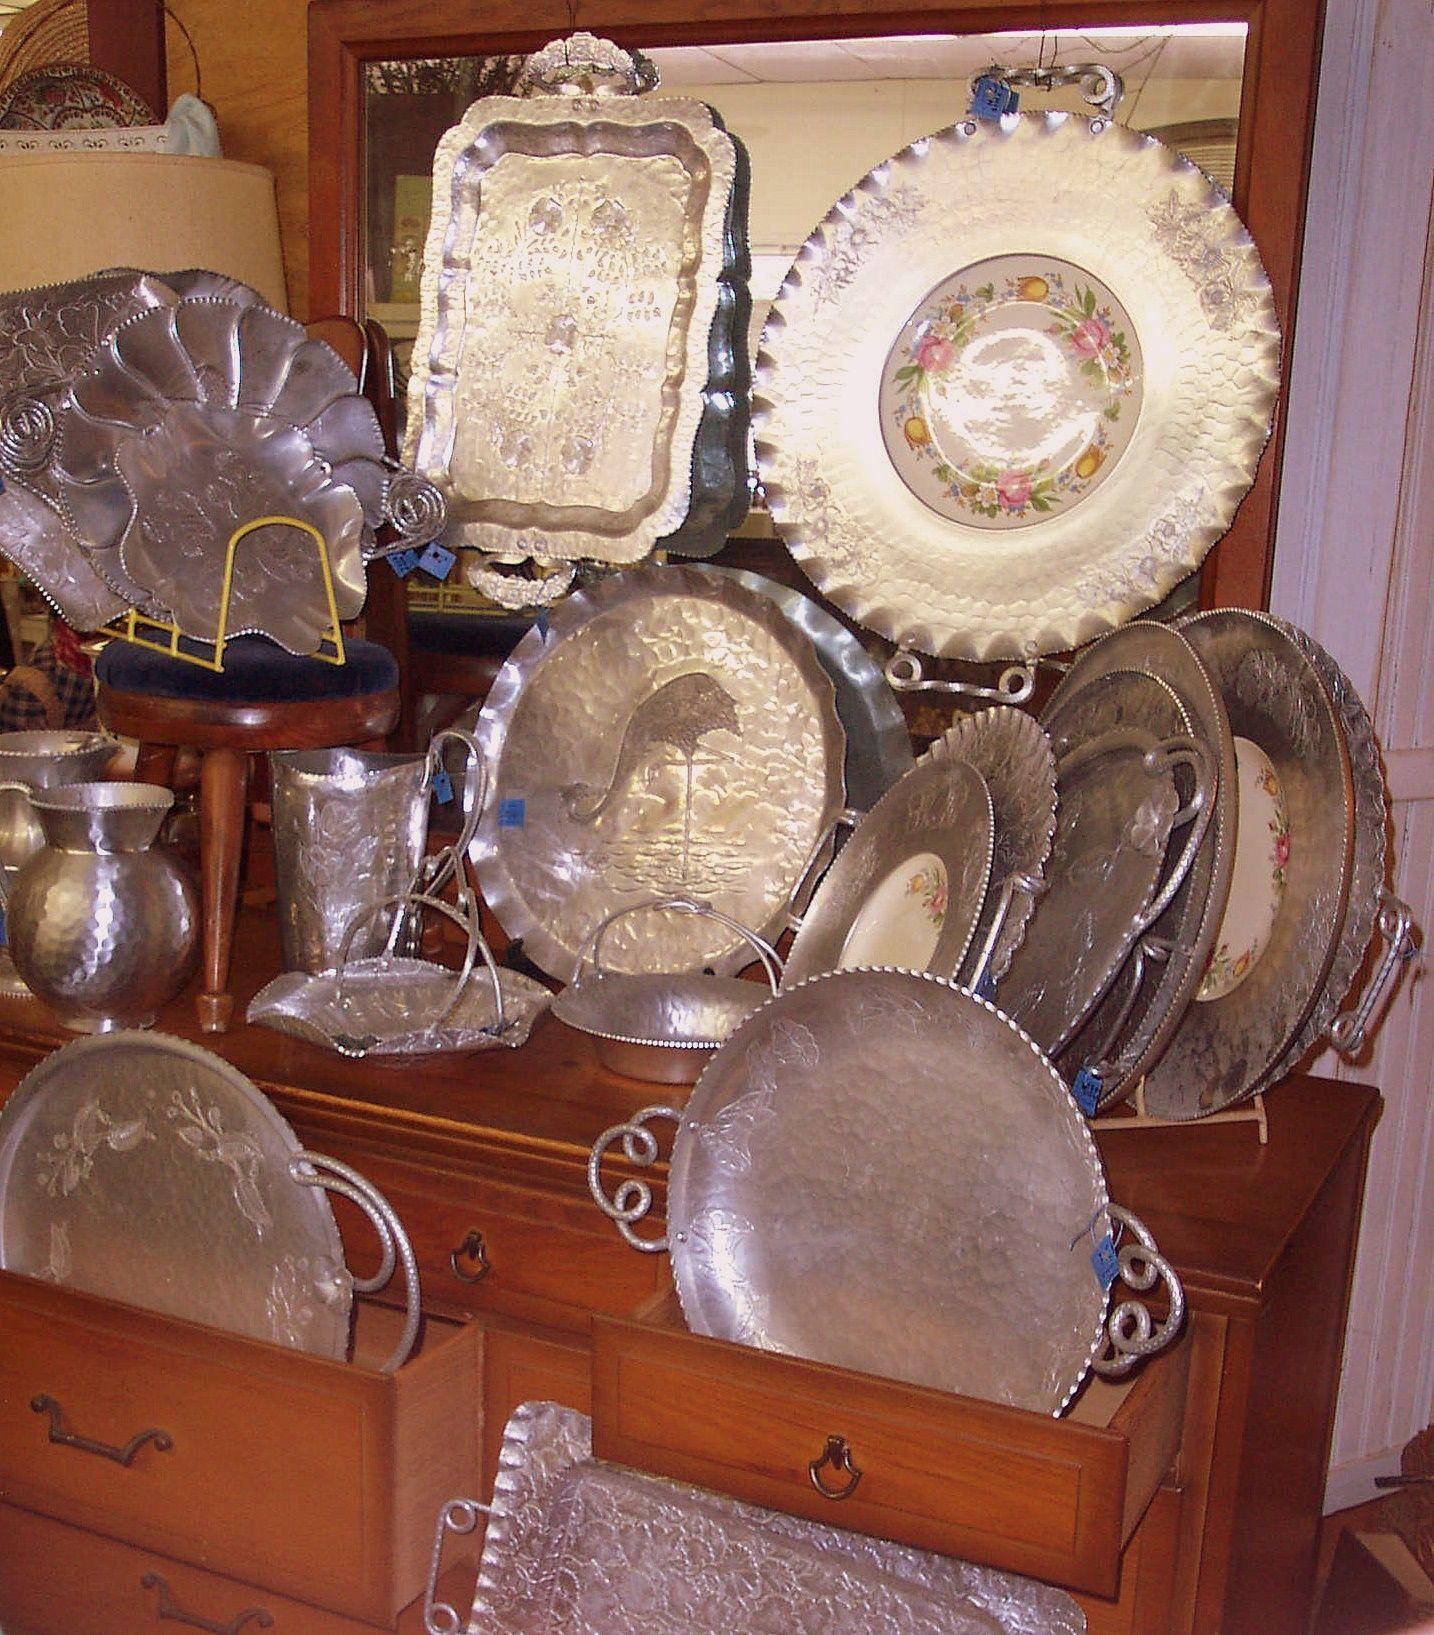 50 S Era Hammered Aluminum Trays Bowls Vintage Trays Vintage Display Vintage Decor